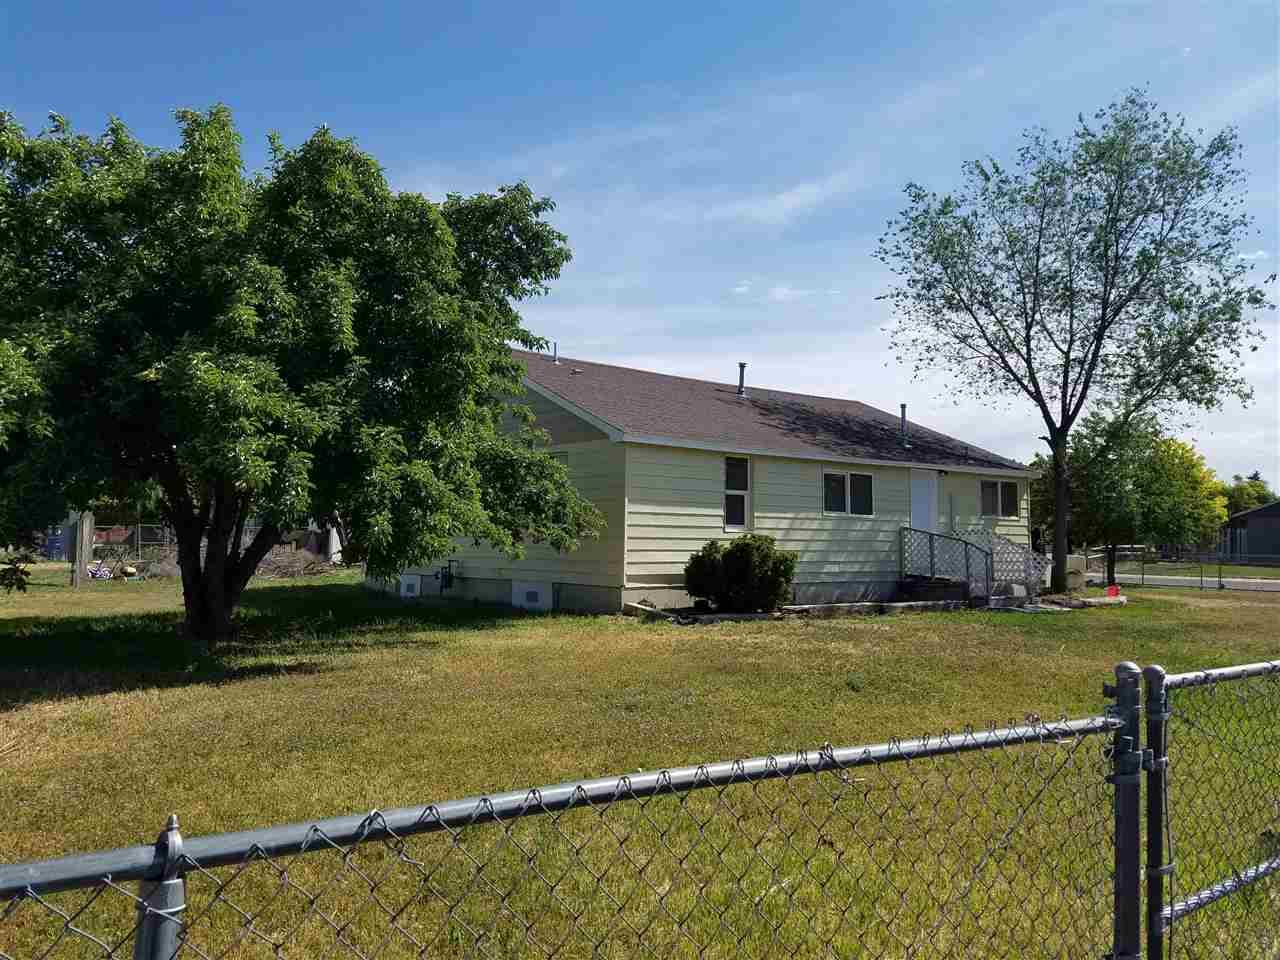 独户住宅 为 销售 在 332 S Milner Street 332 S Milner Street Wendell, 爱达荷州 83355